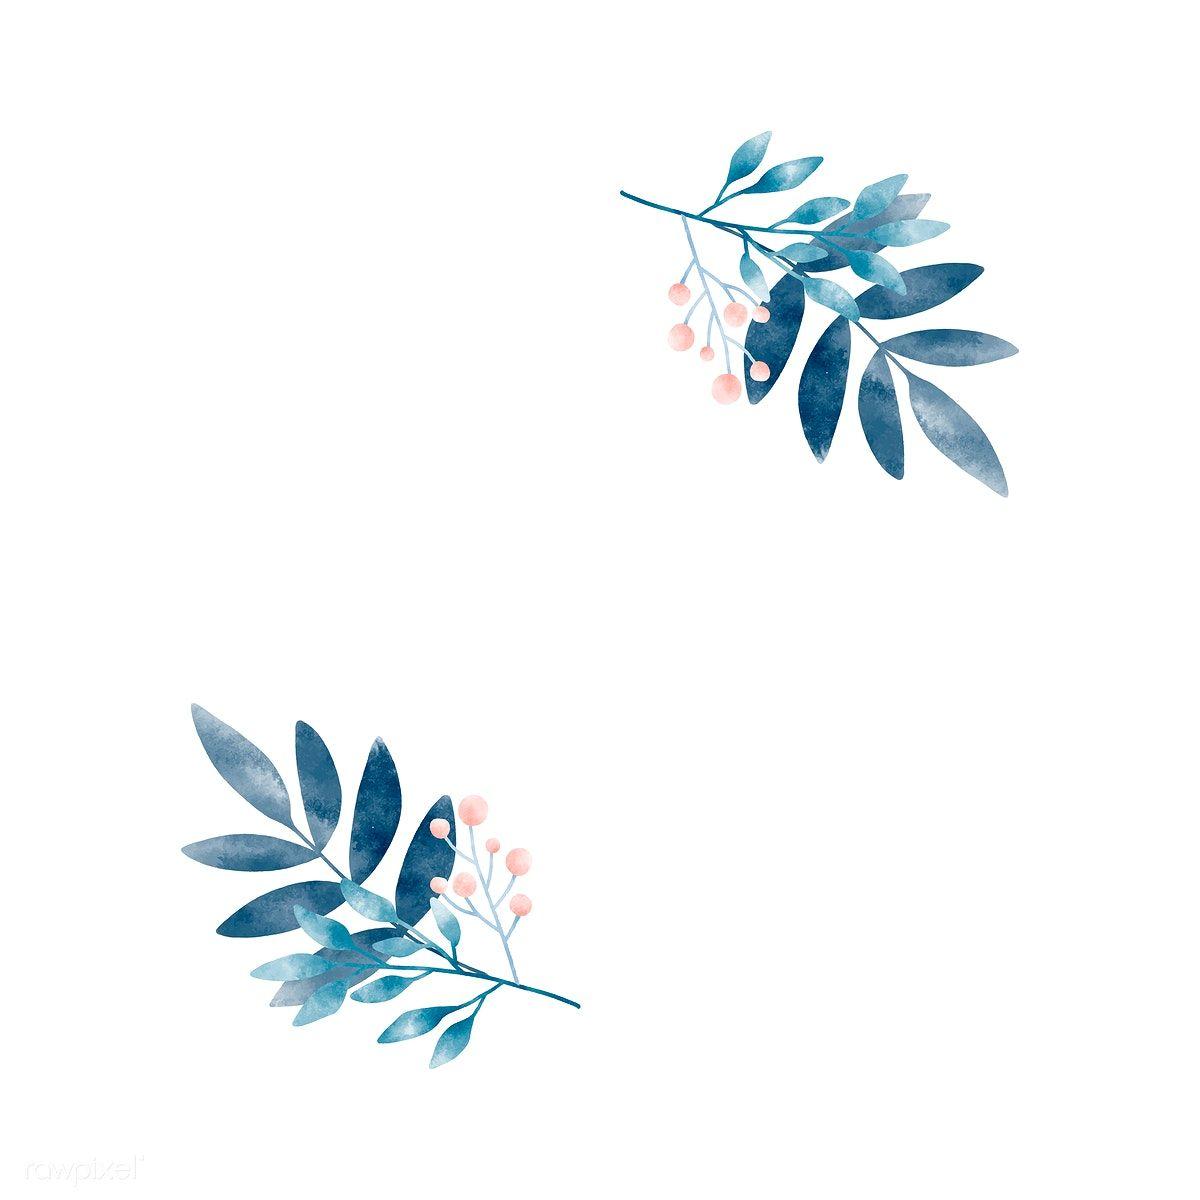 Download premium vector of Watercolor leaves with berries